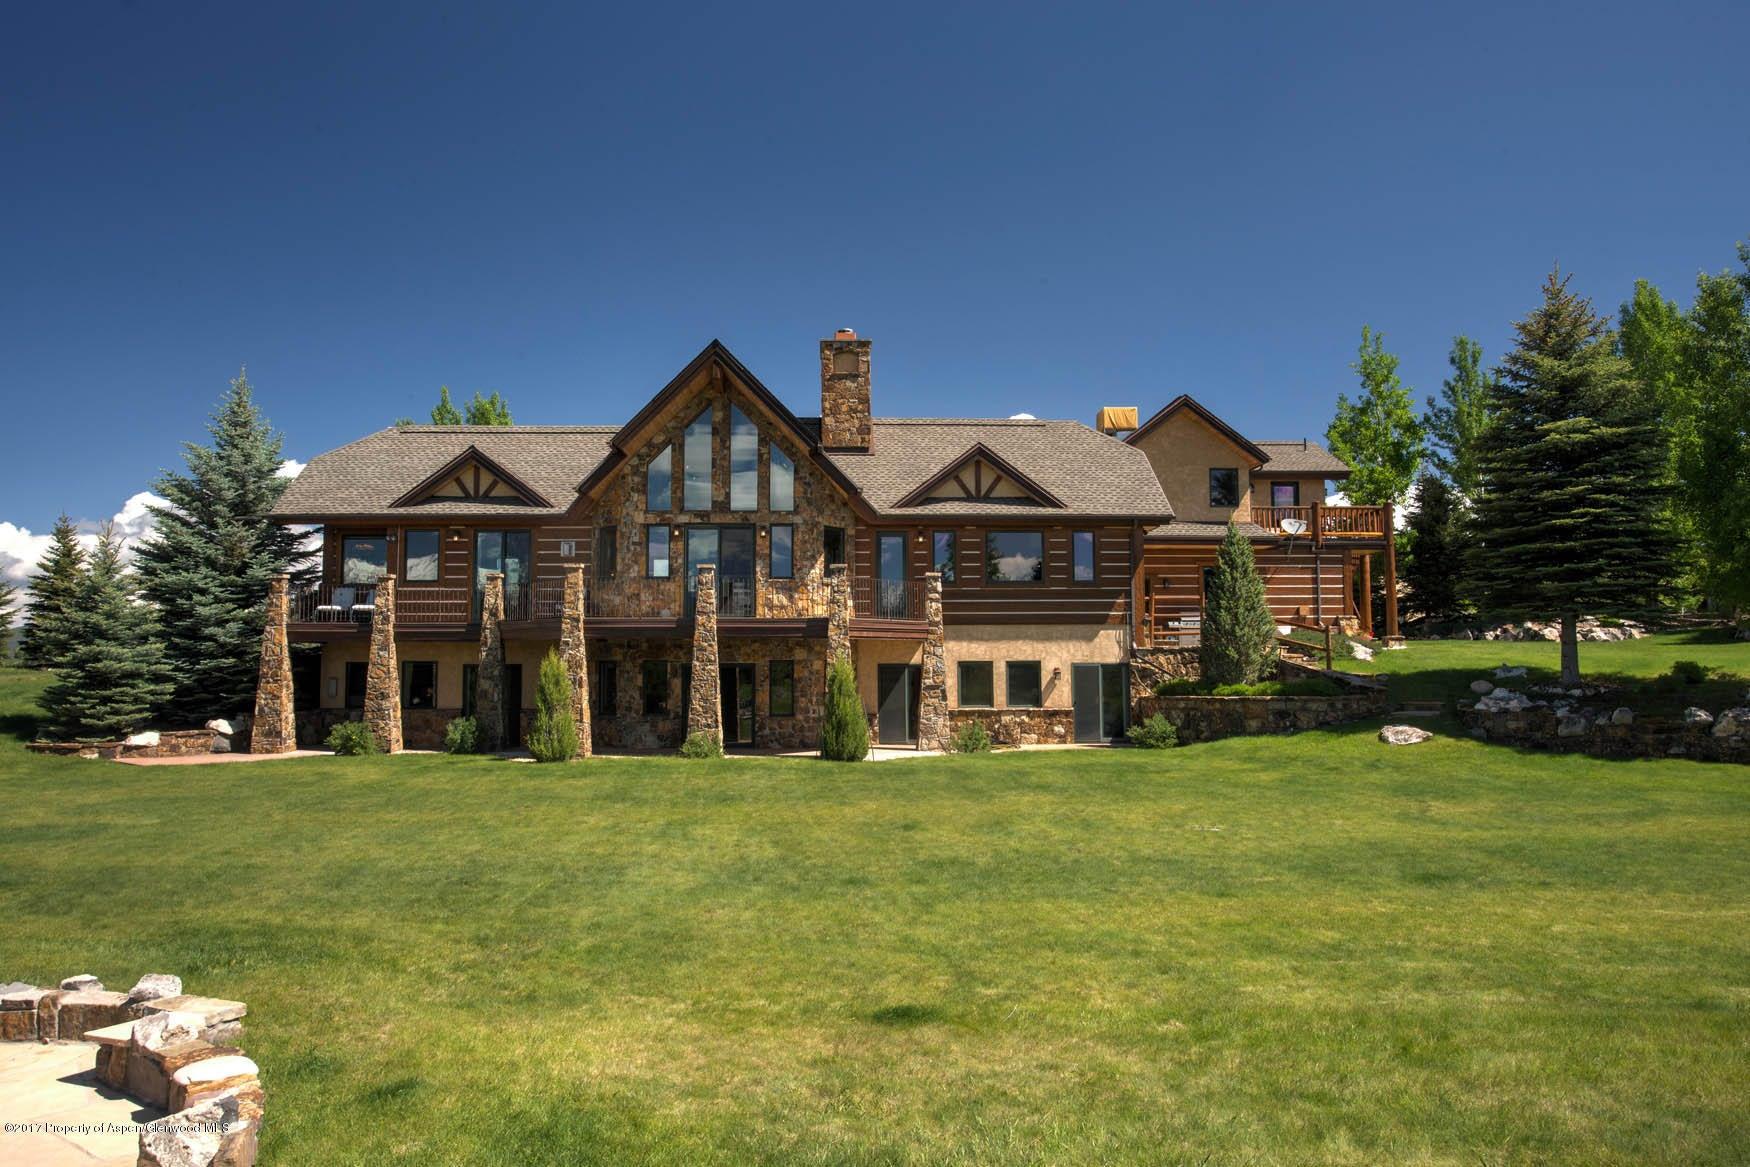 435 Fox Run - Missouri Heights, Colorado